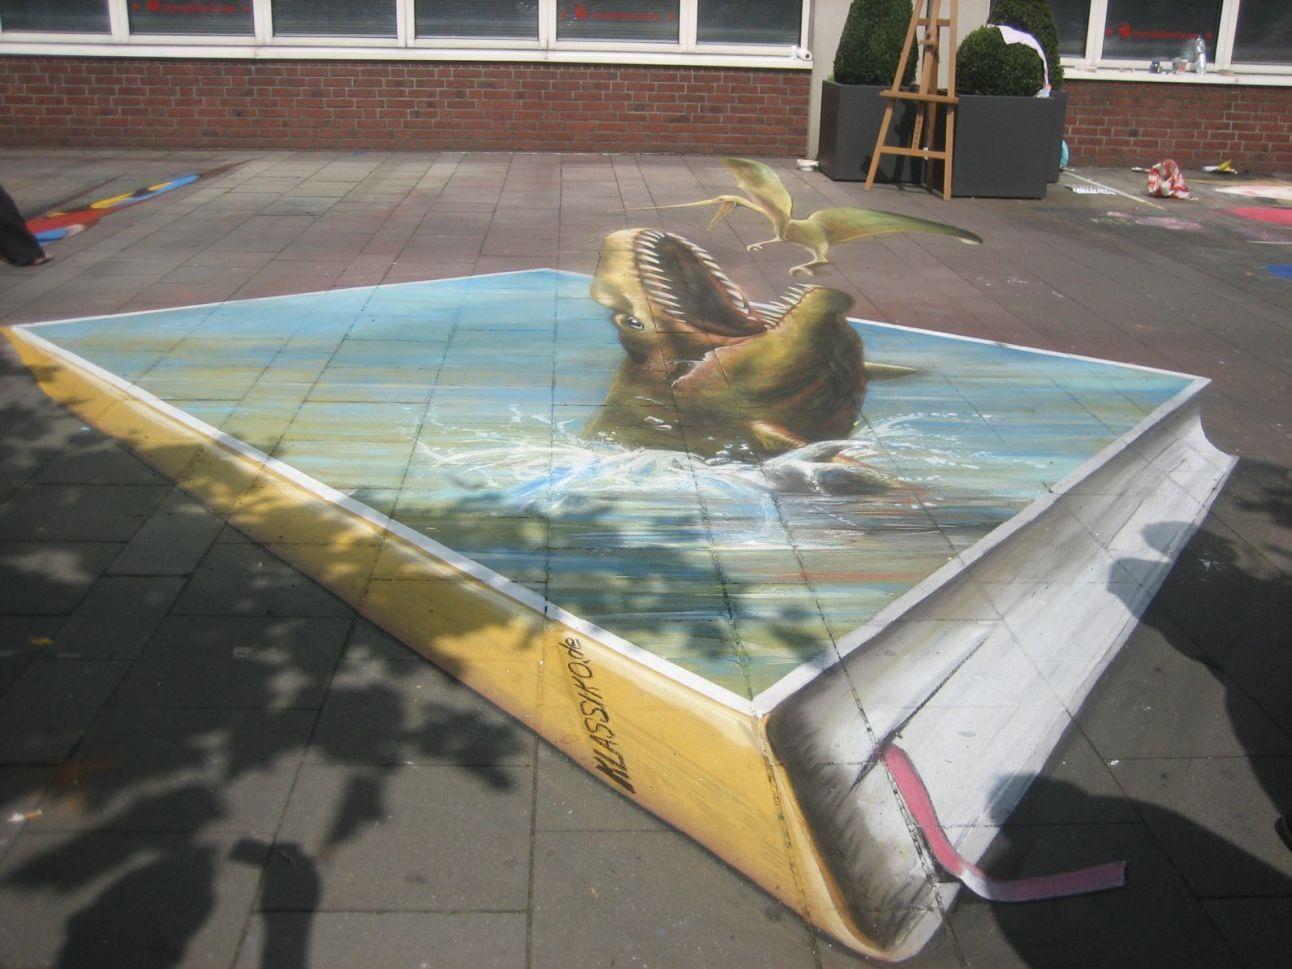 amazing-art-3d-street-art-part-two (77).jpg 1292×969 pixels